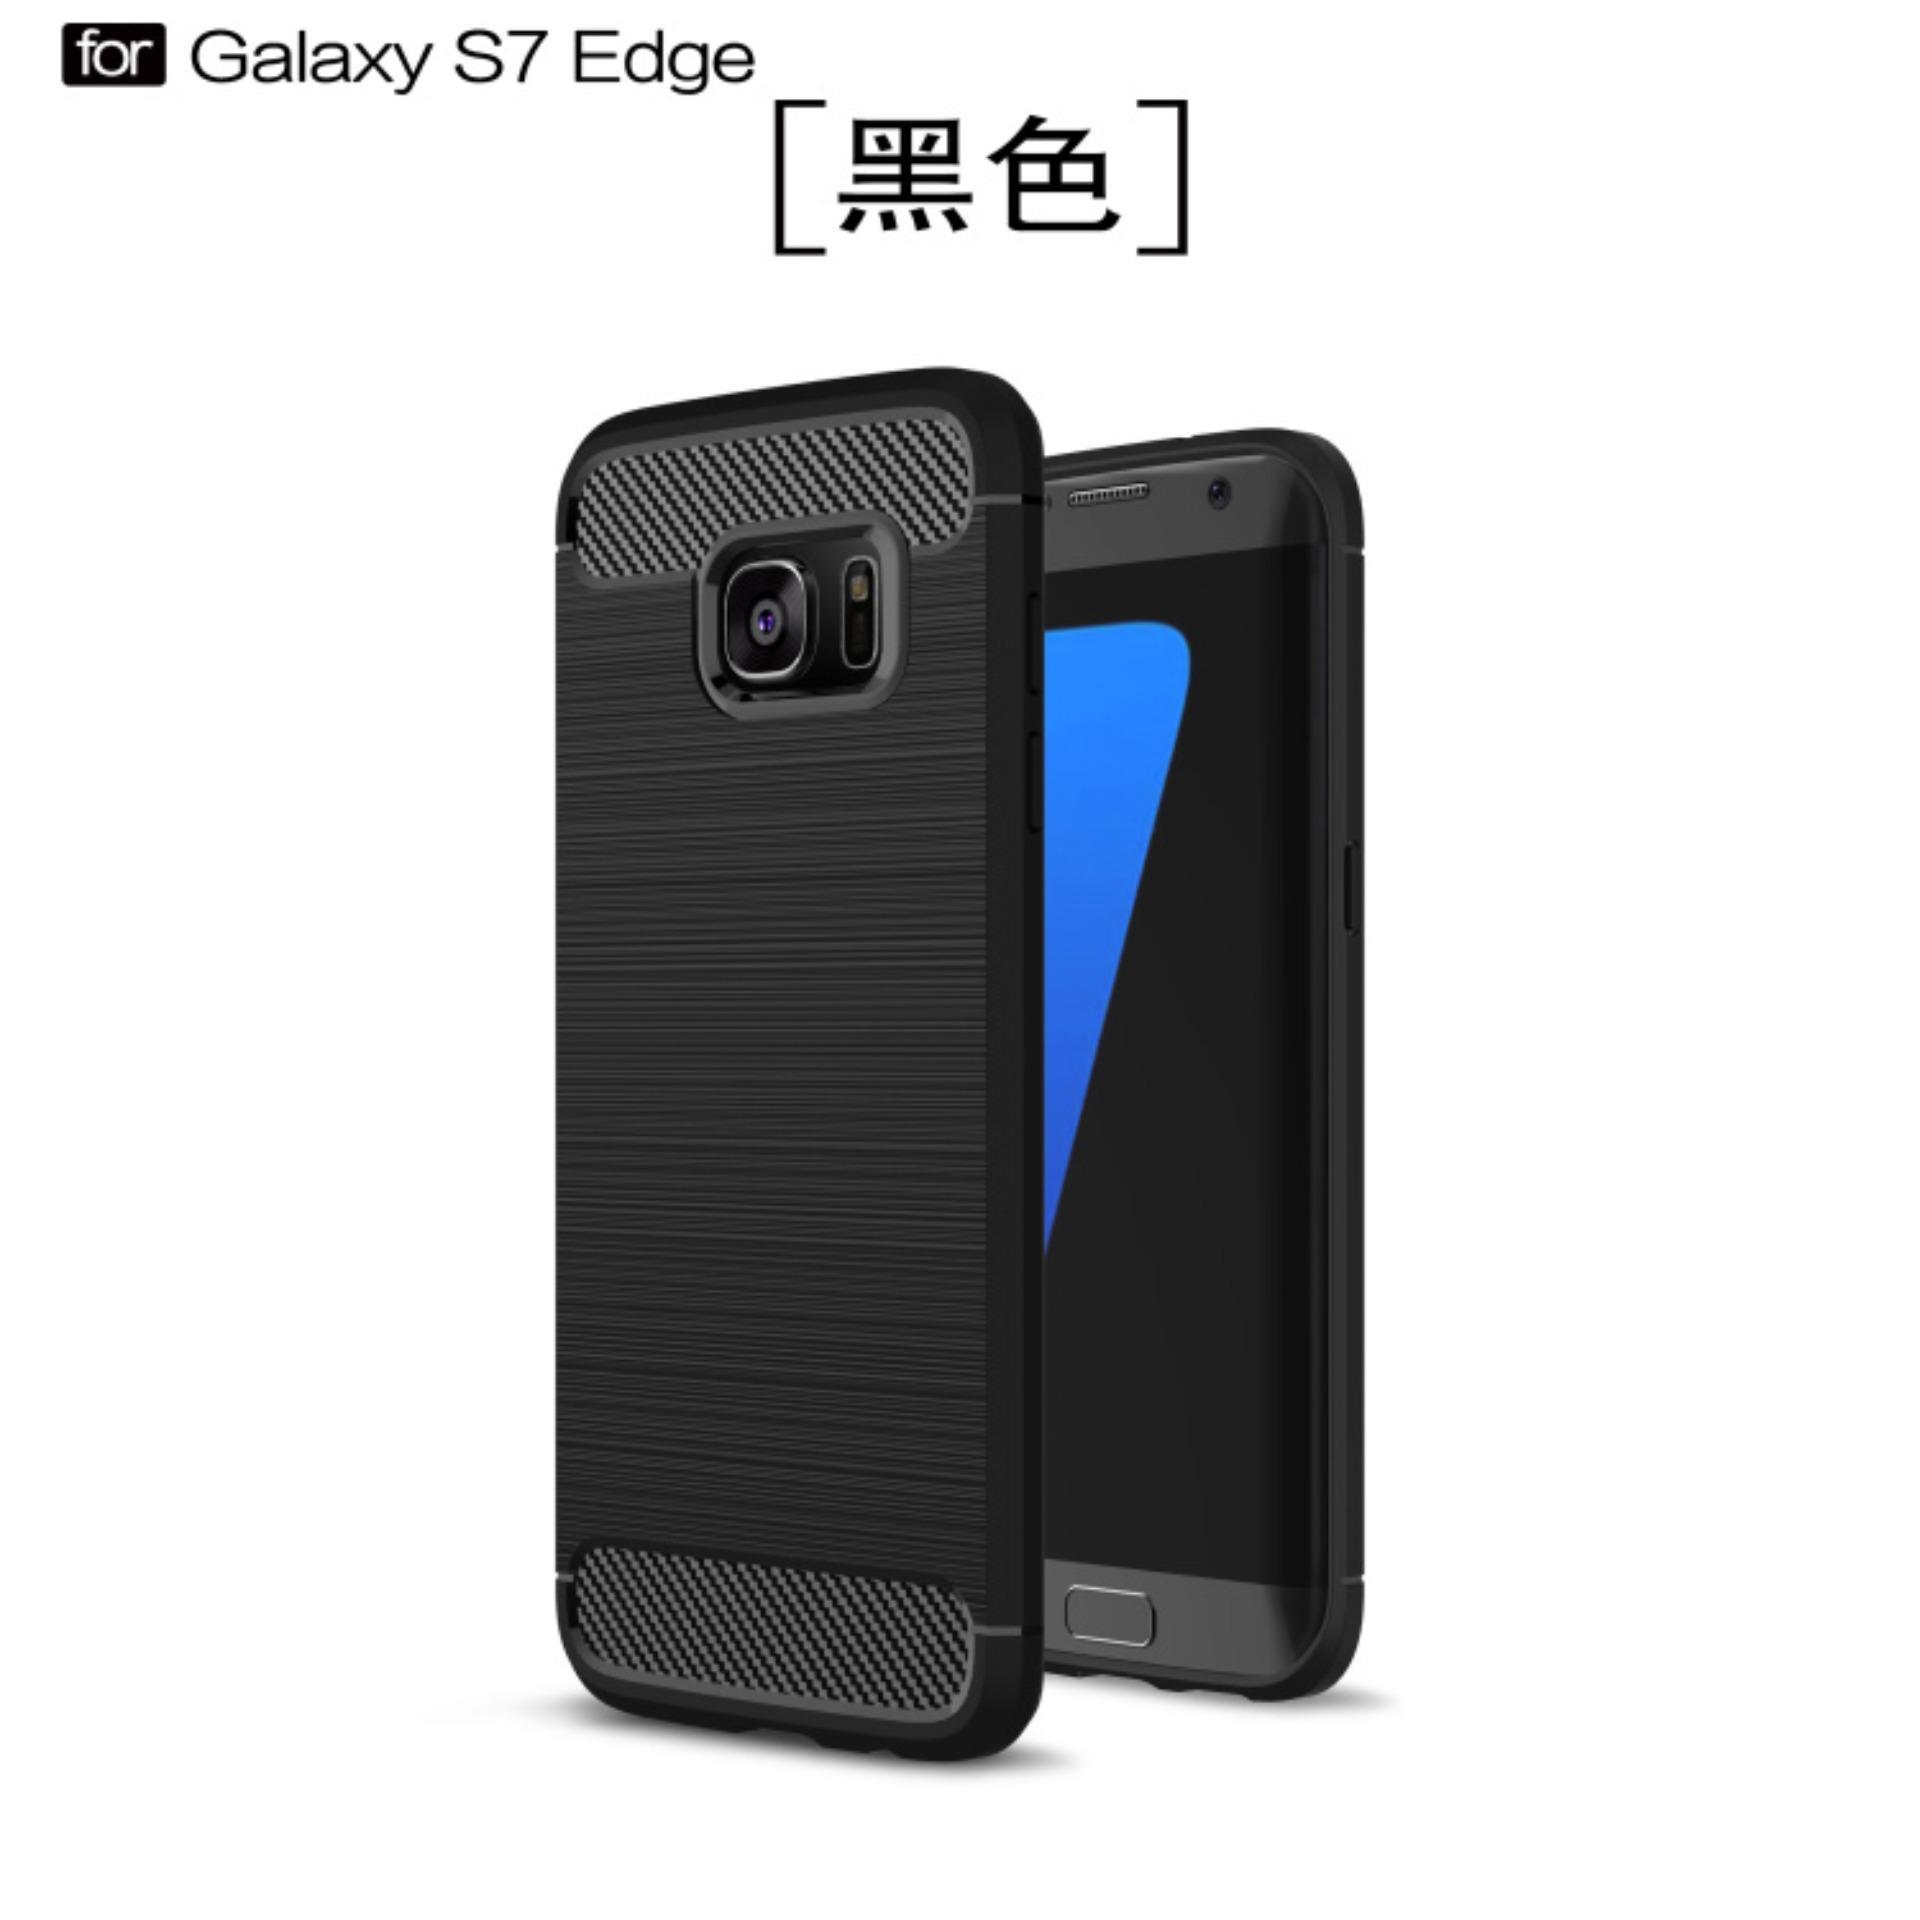 Samsung Galaxy S7 Edge Rugged Armor Case – Black